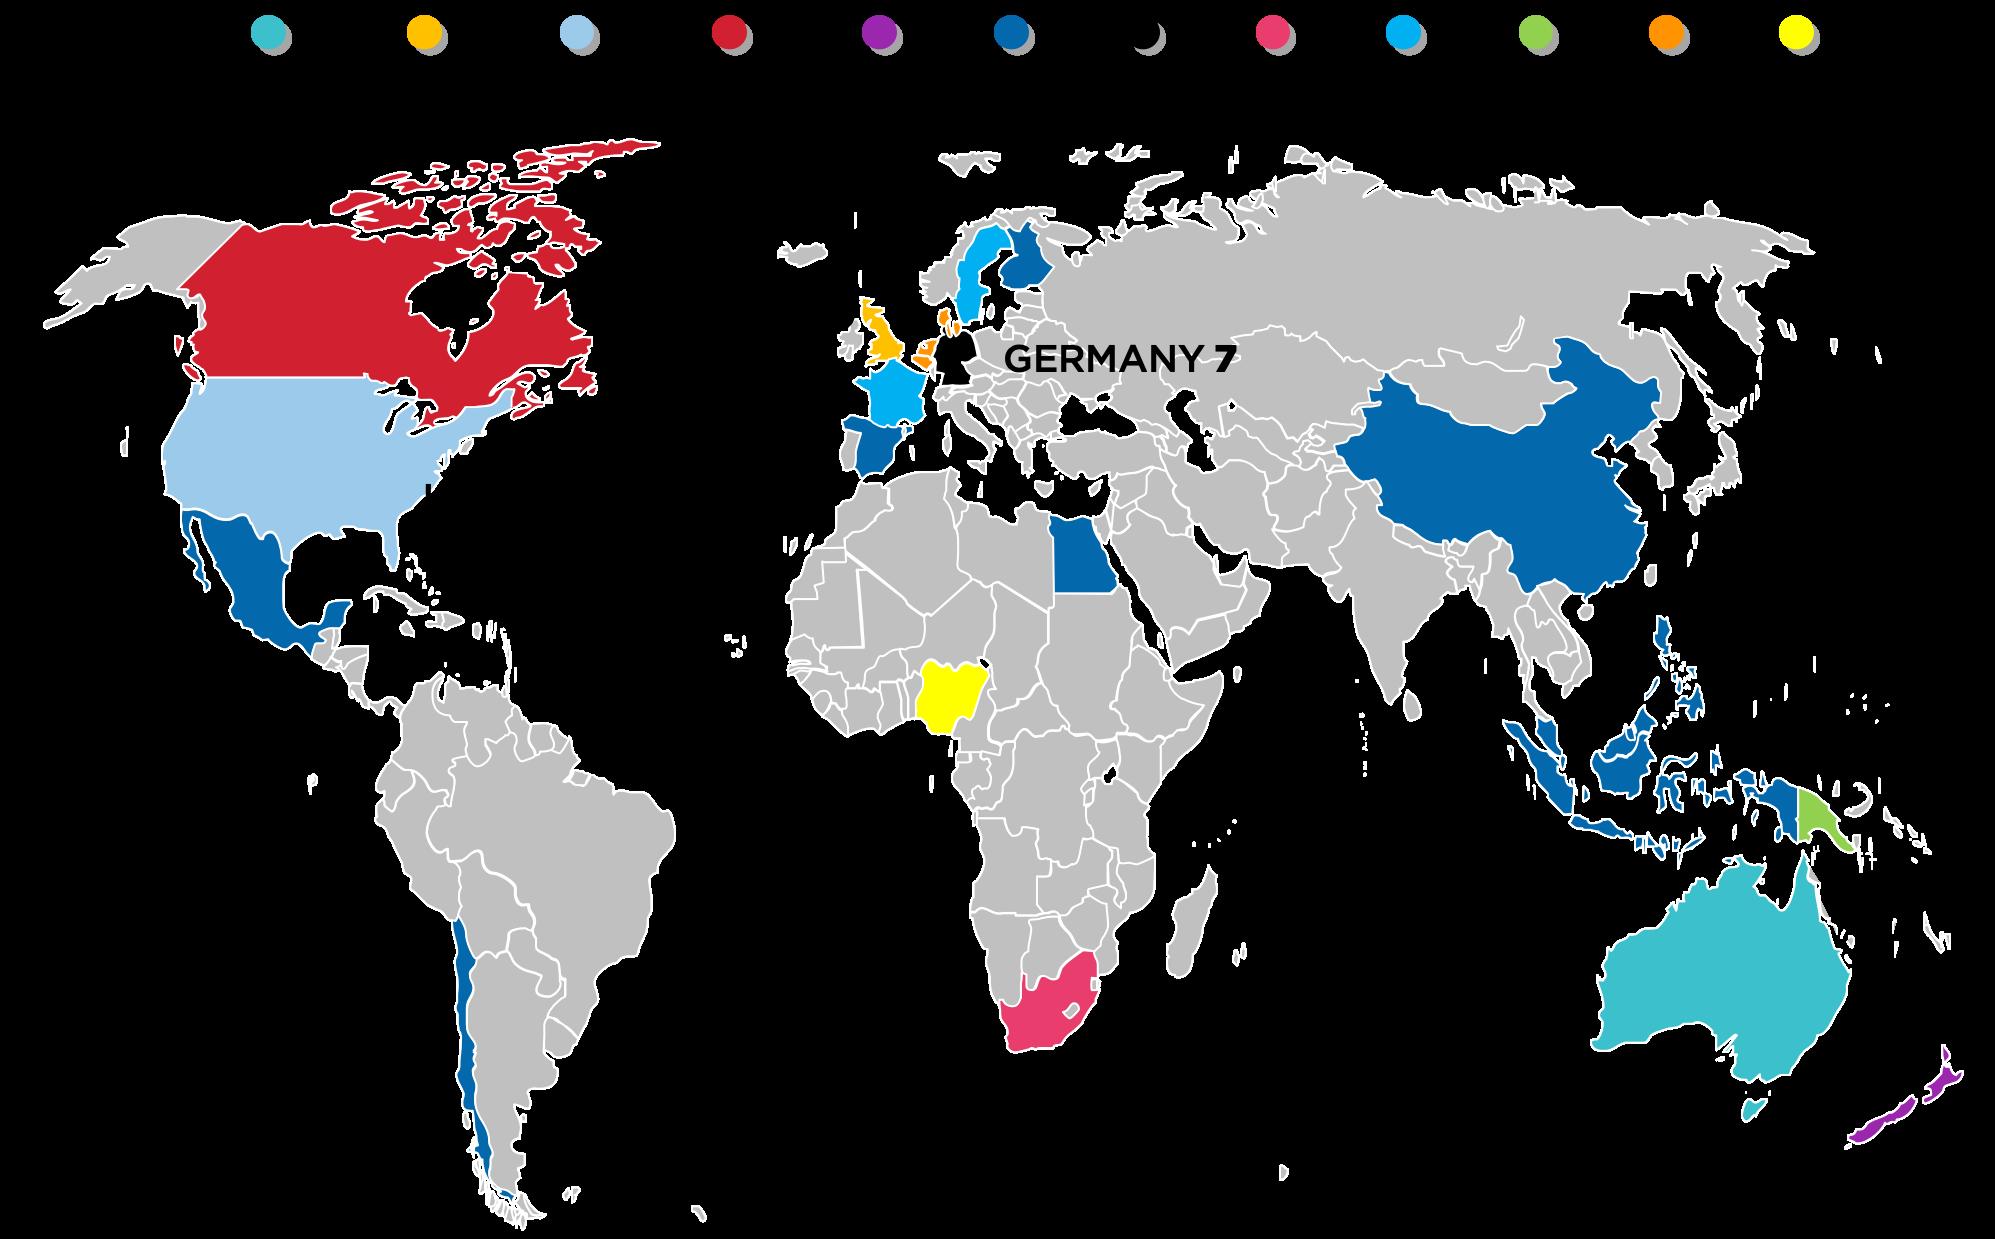 GLOBAL DISTRIBUTION OF CAUDIT HE EA REFERENCE MODELS